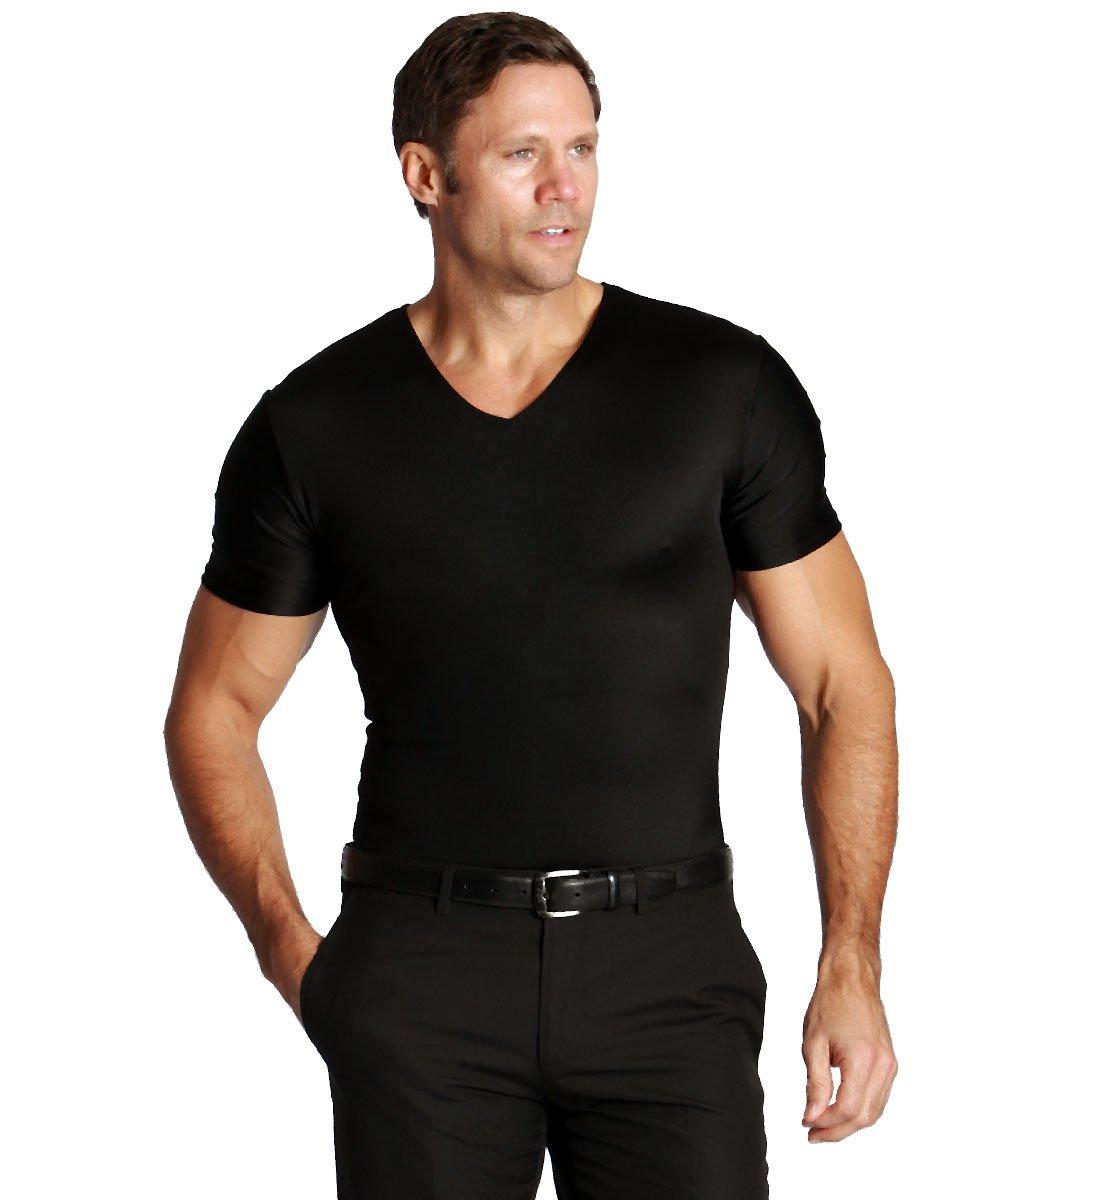 Insta Slim Mens Nylon Shapewear T Shirt (Black, S)